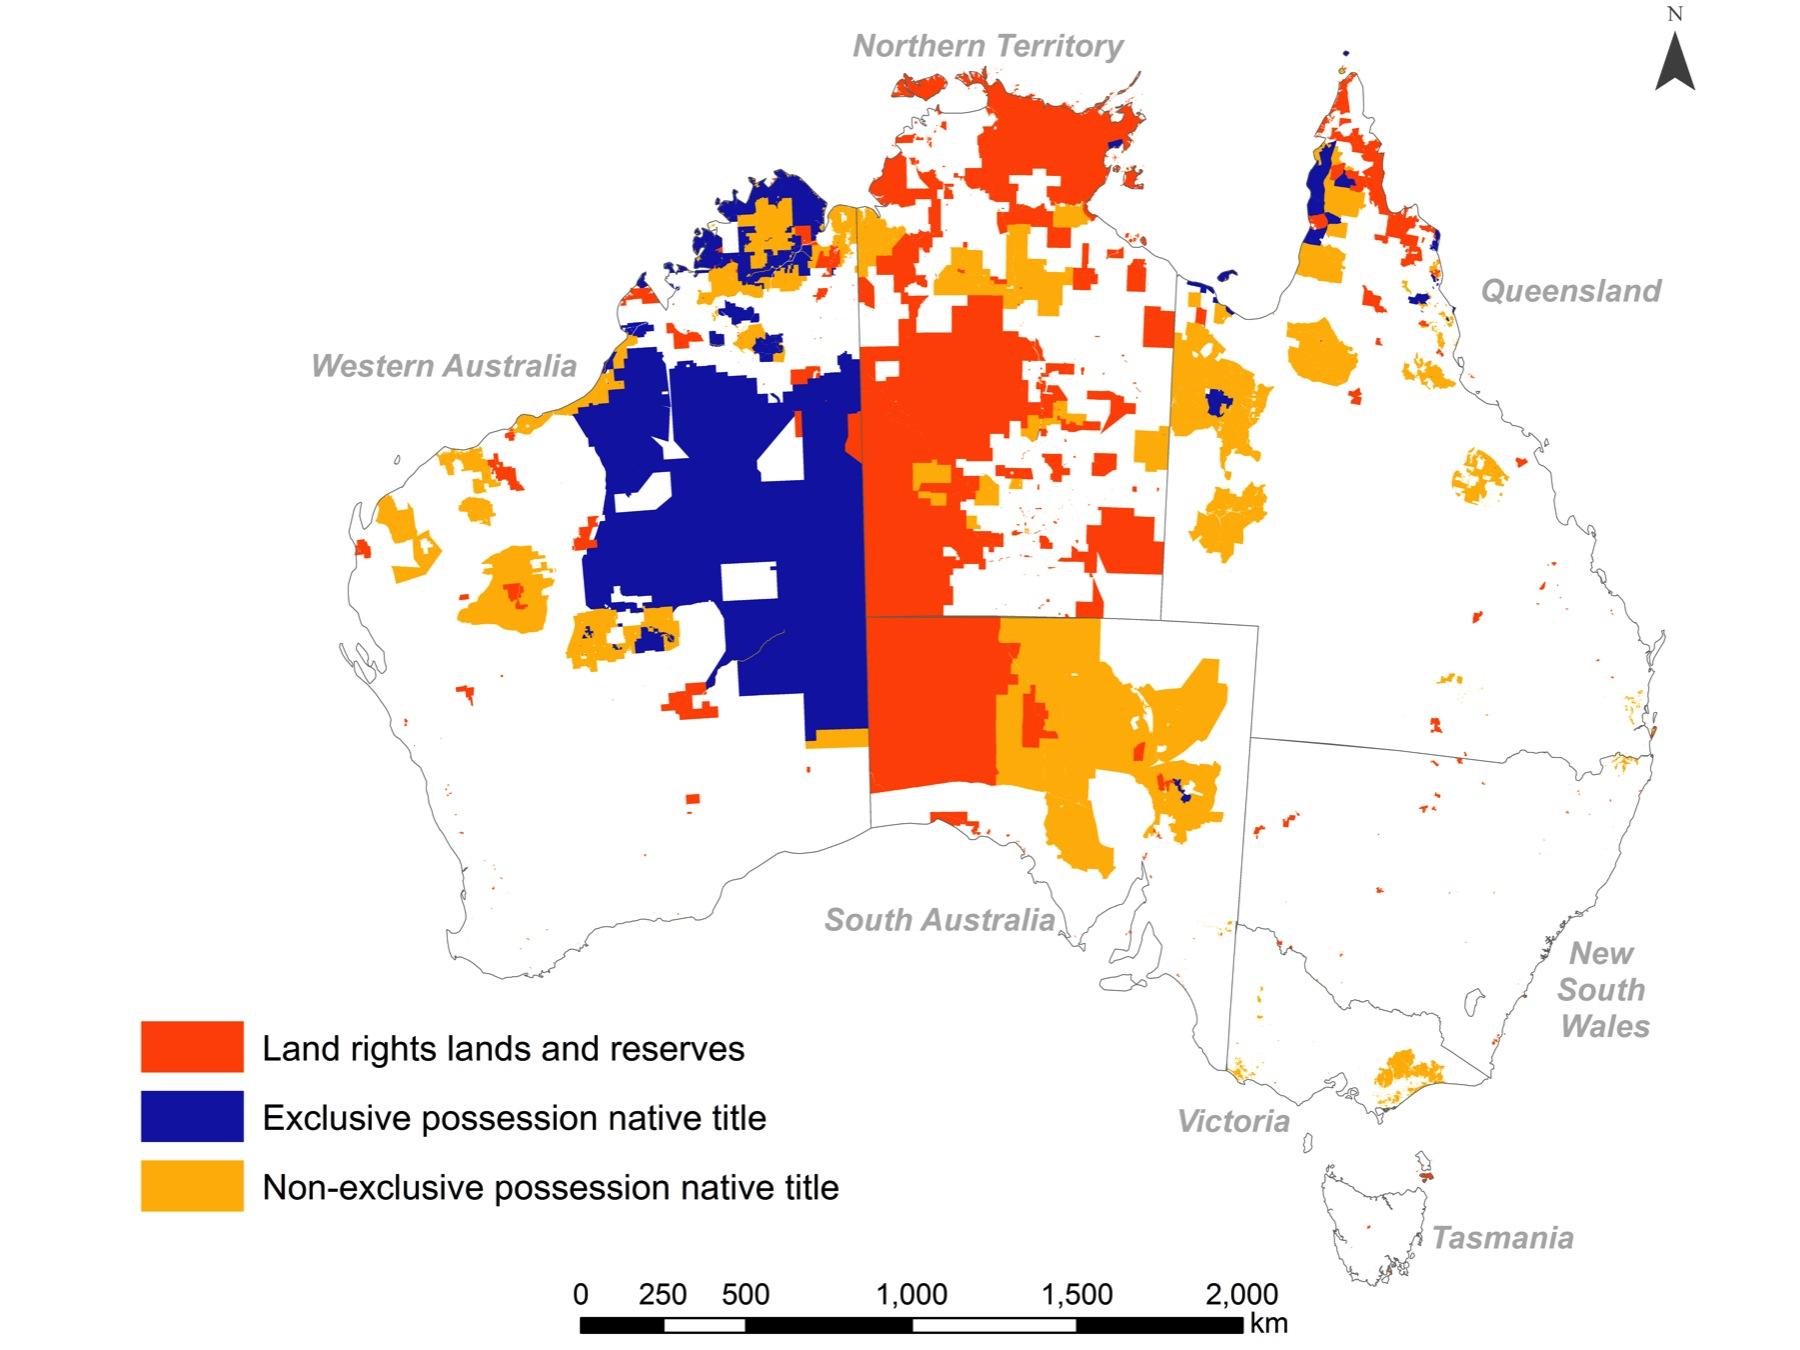 Altman and Markham map showing Aboriginal and Torres Strait Islander land in 2013